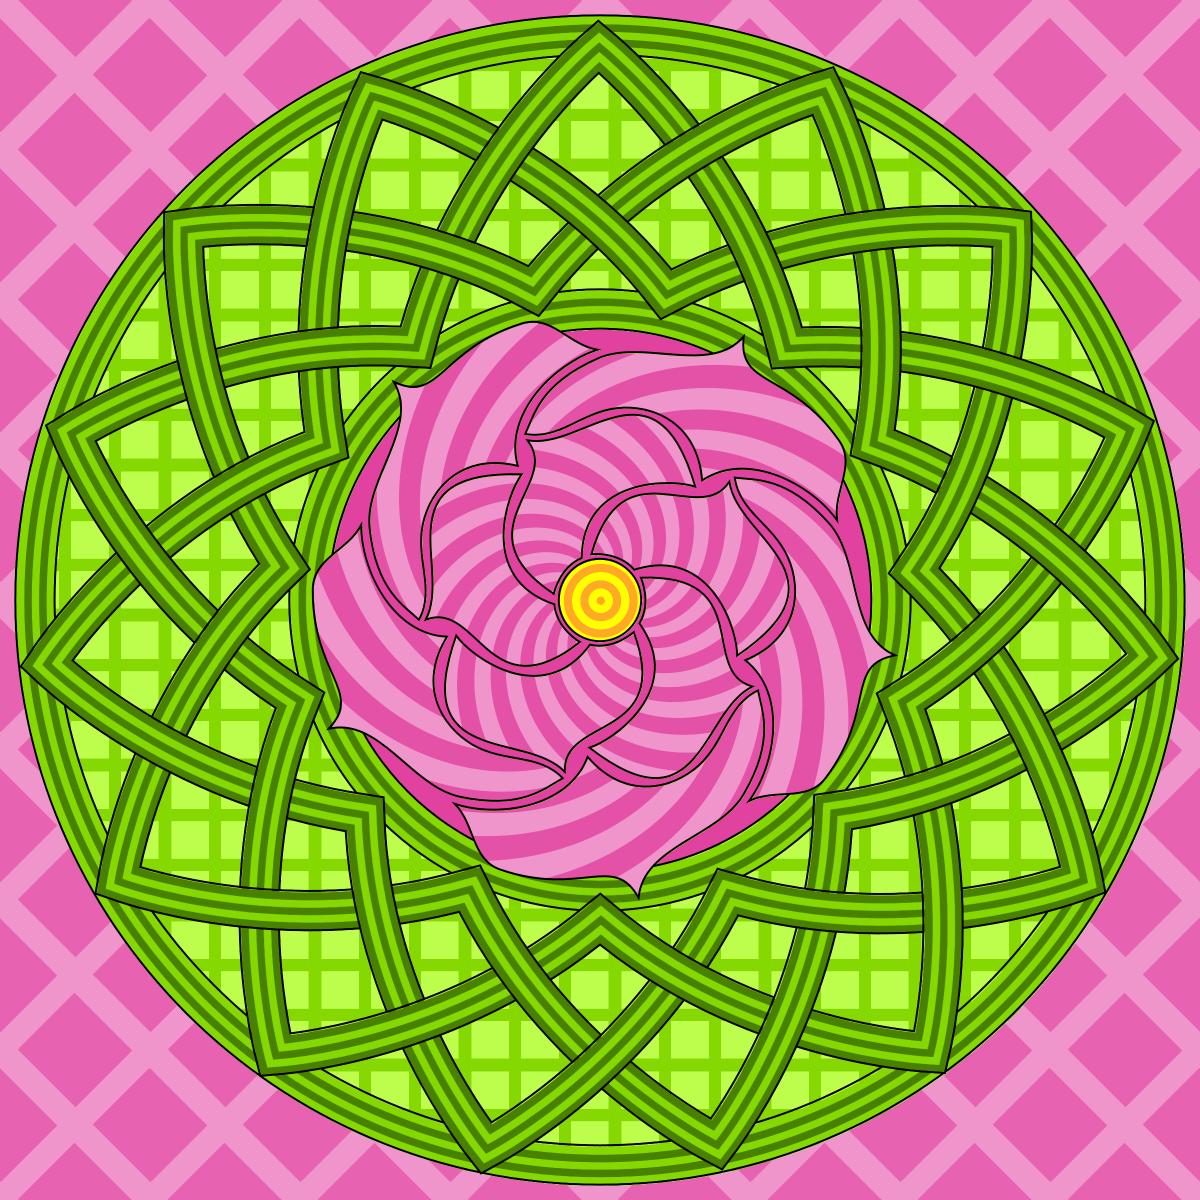 Mandala-Rose Coloring Page | mandala | Pinterest | Mandala ...